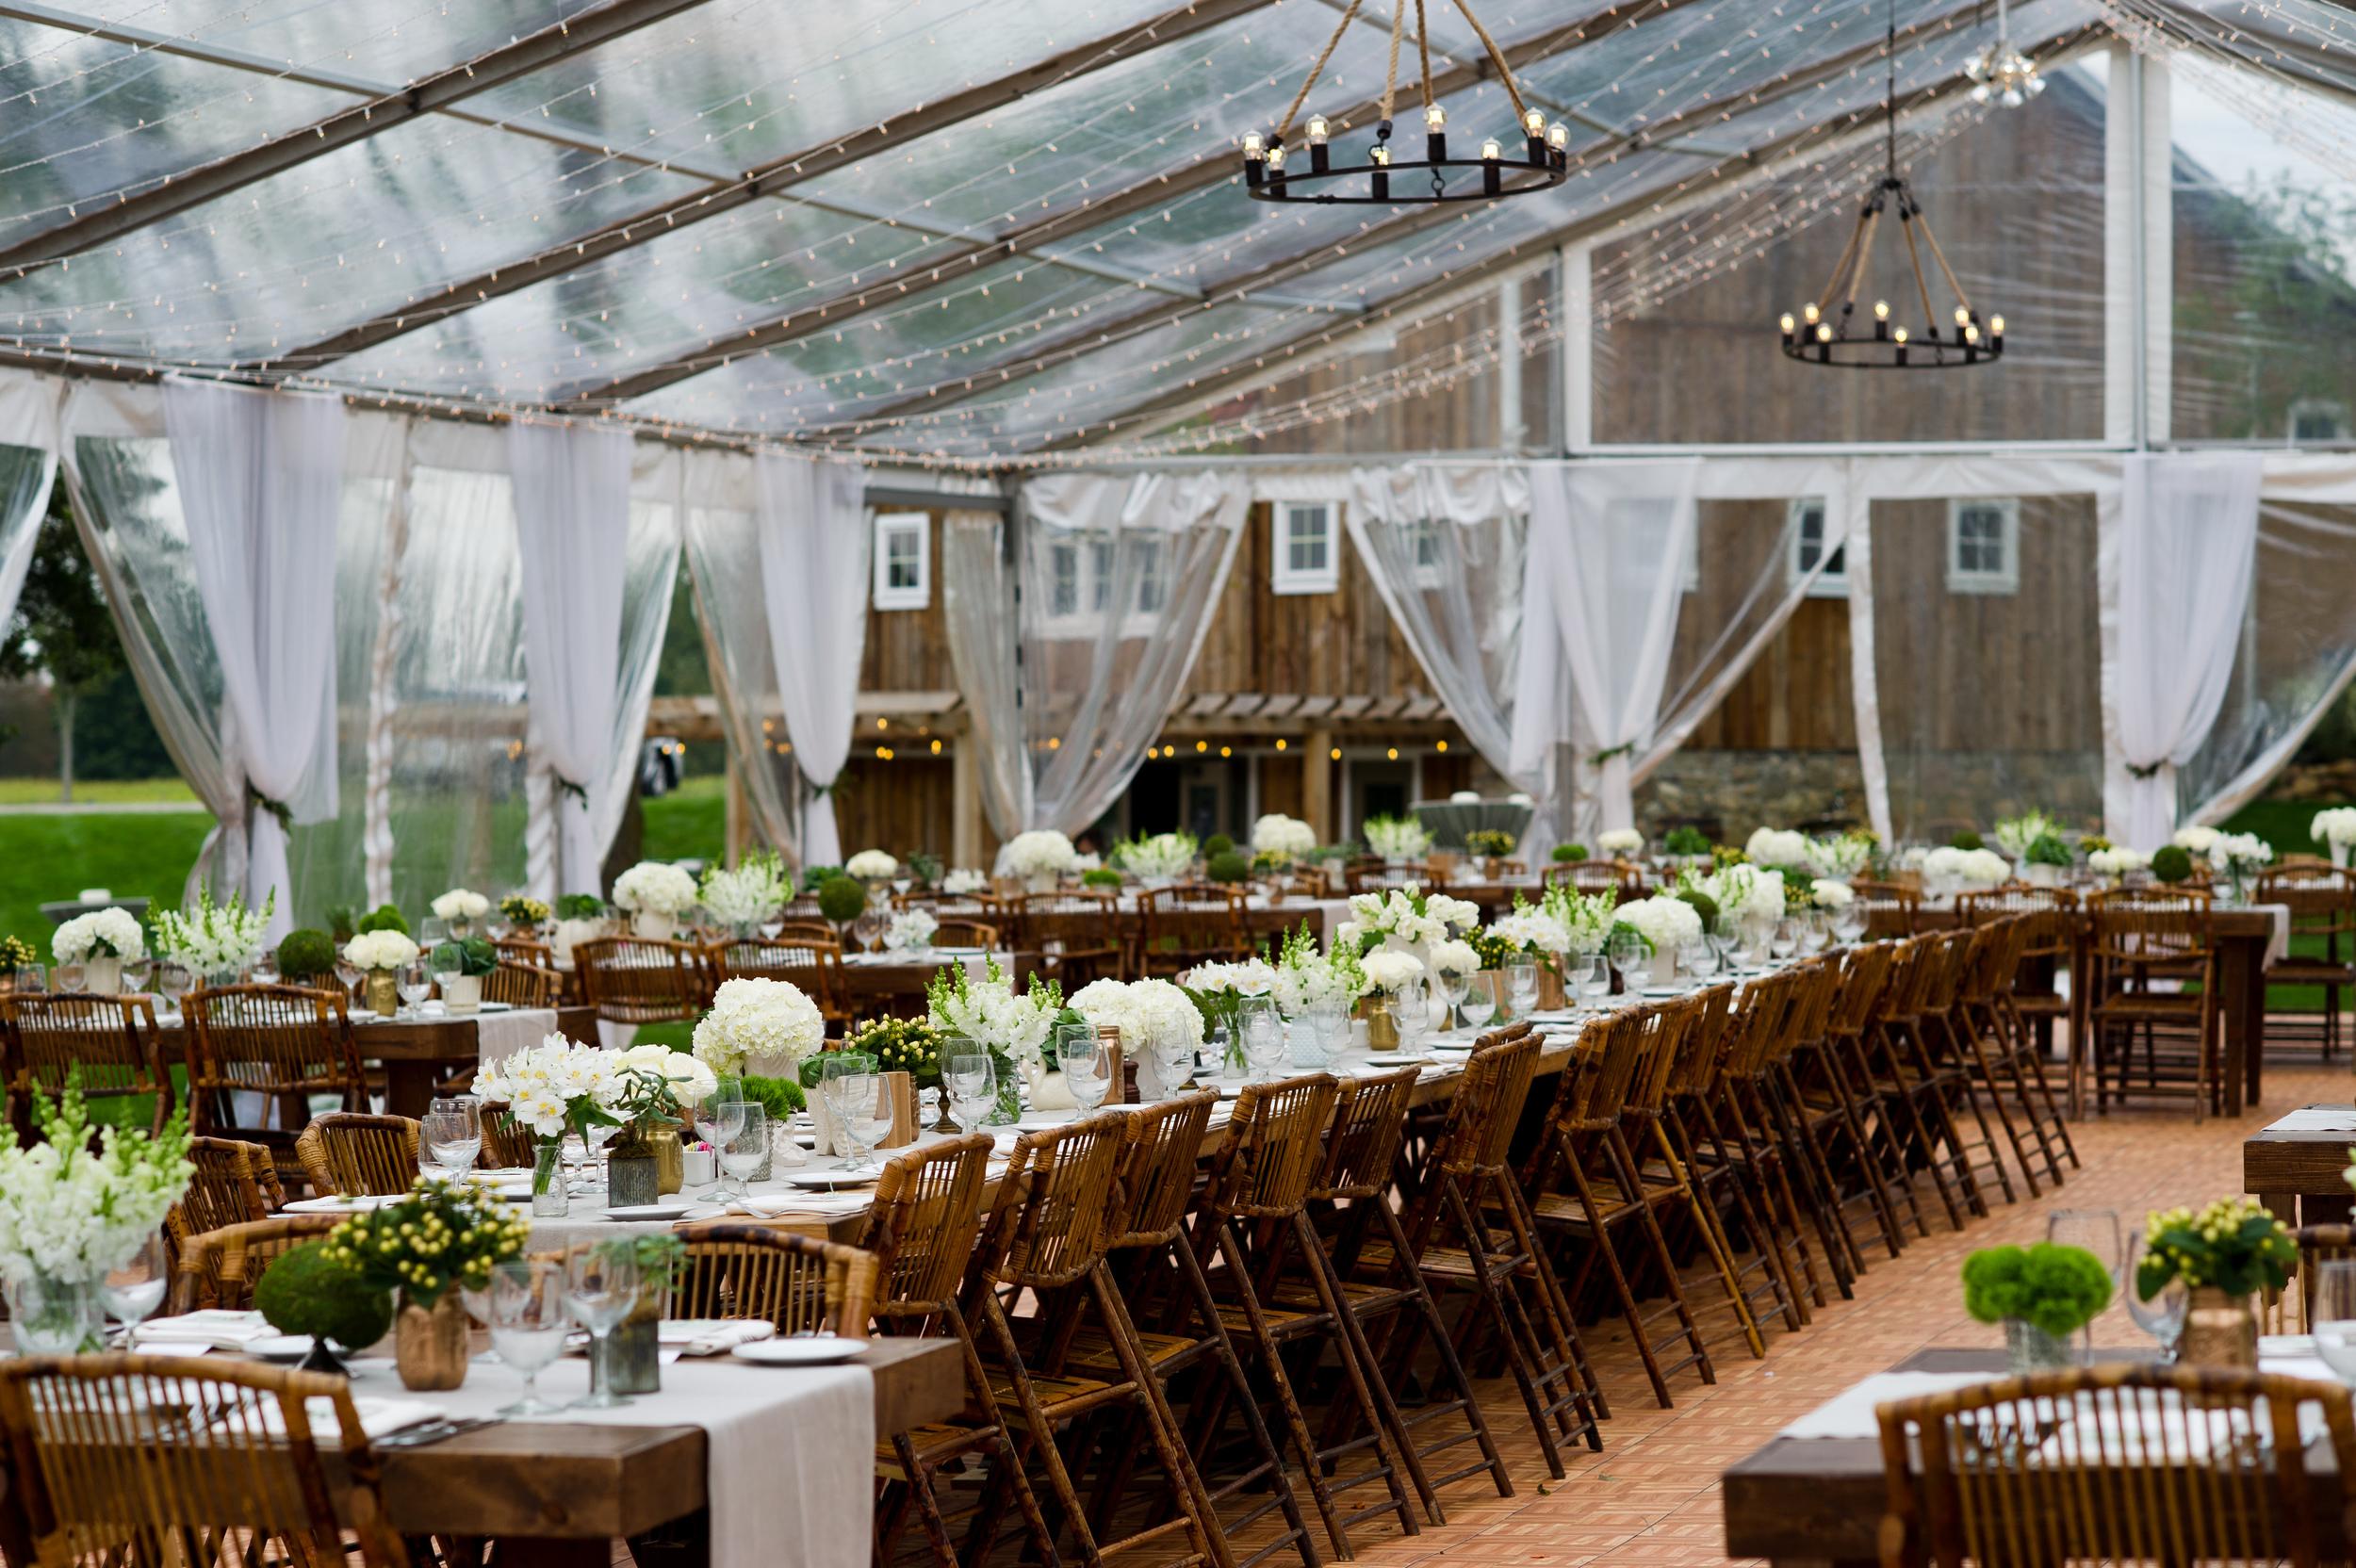 cornman-farm-wedding-7